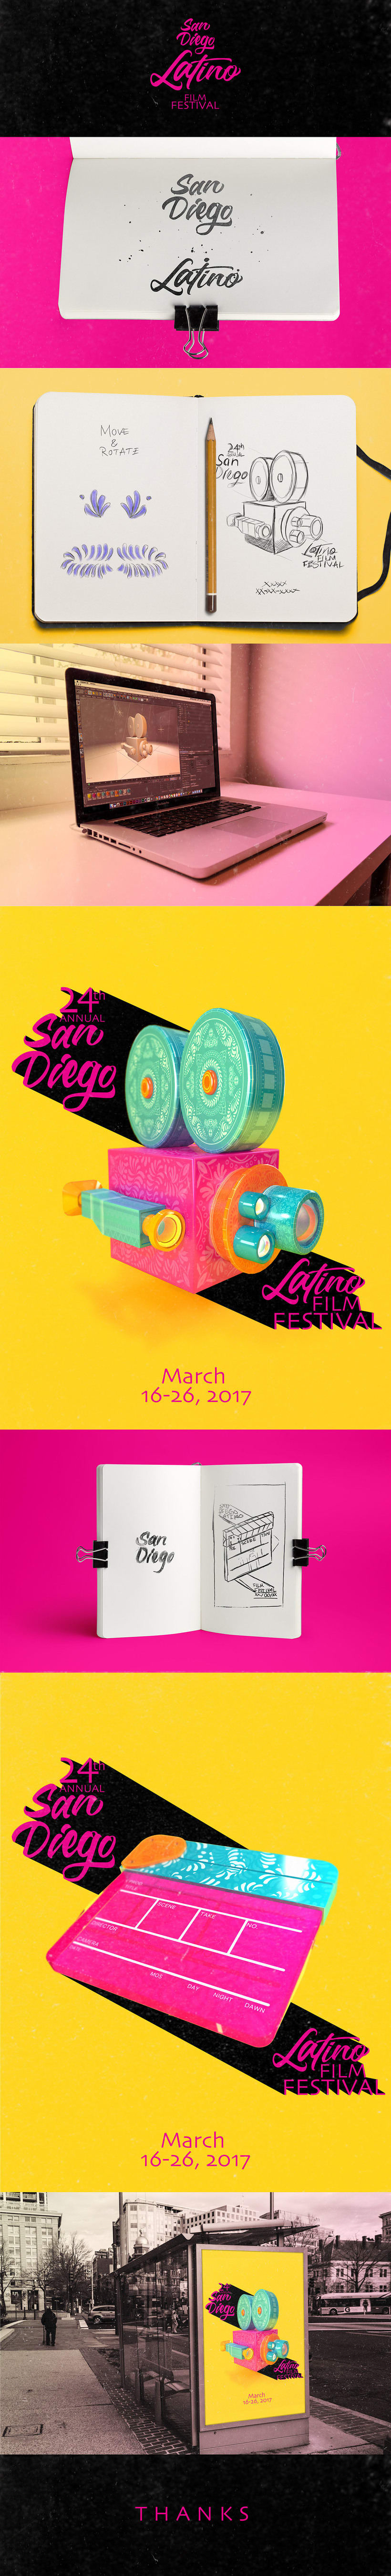 San Diego Latino Film Festival -1